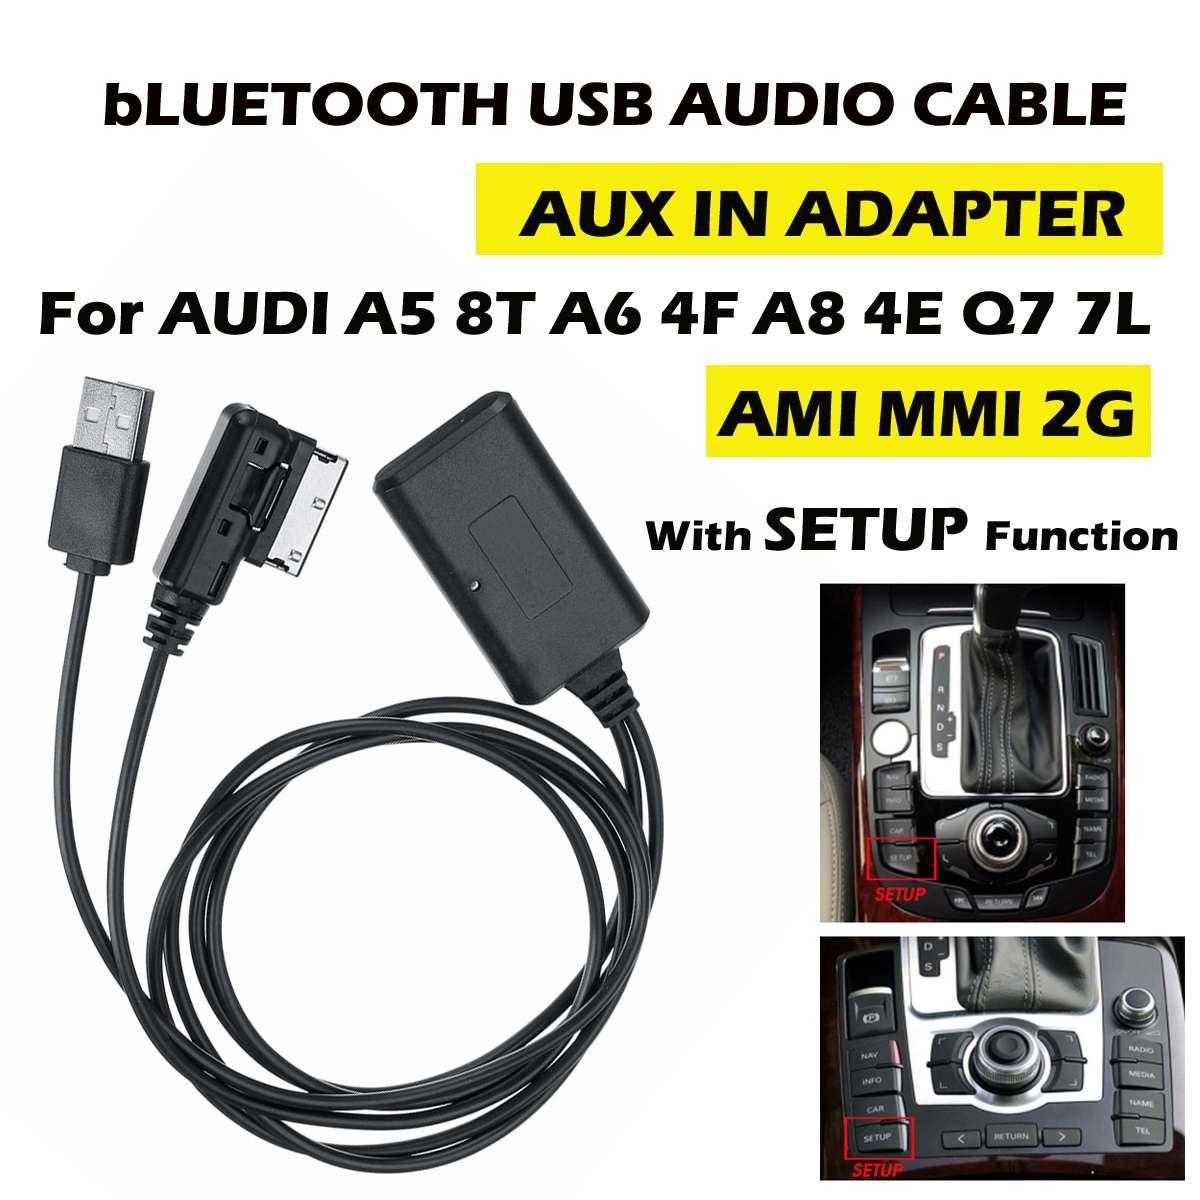 HIFI  Wireless 75cm Bluetooth Cable Audio Adapter Music Transfer AUX In For AUDI A5 8T A6 4F A8 4E Q7 7L AMI MMI 2G